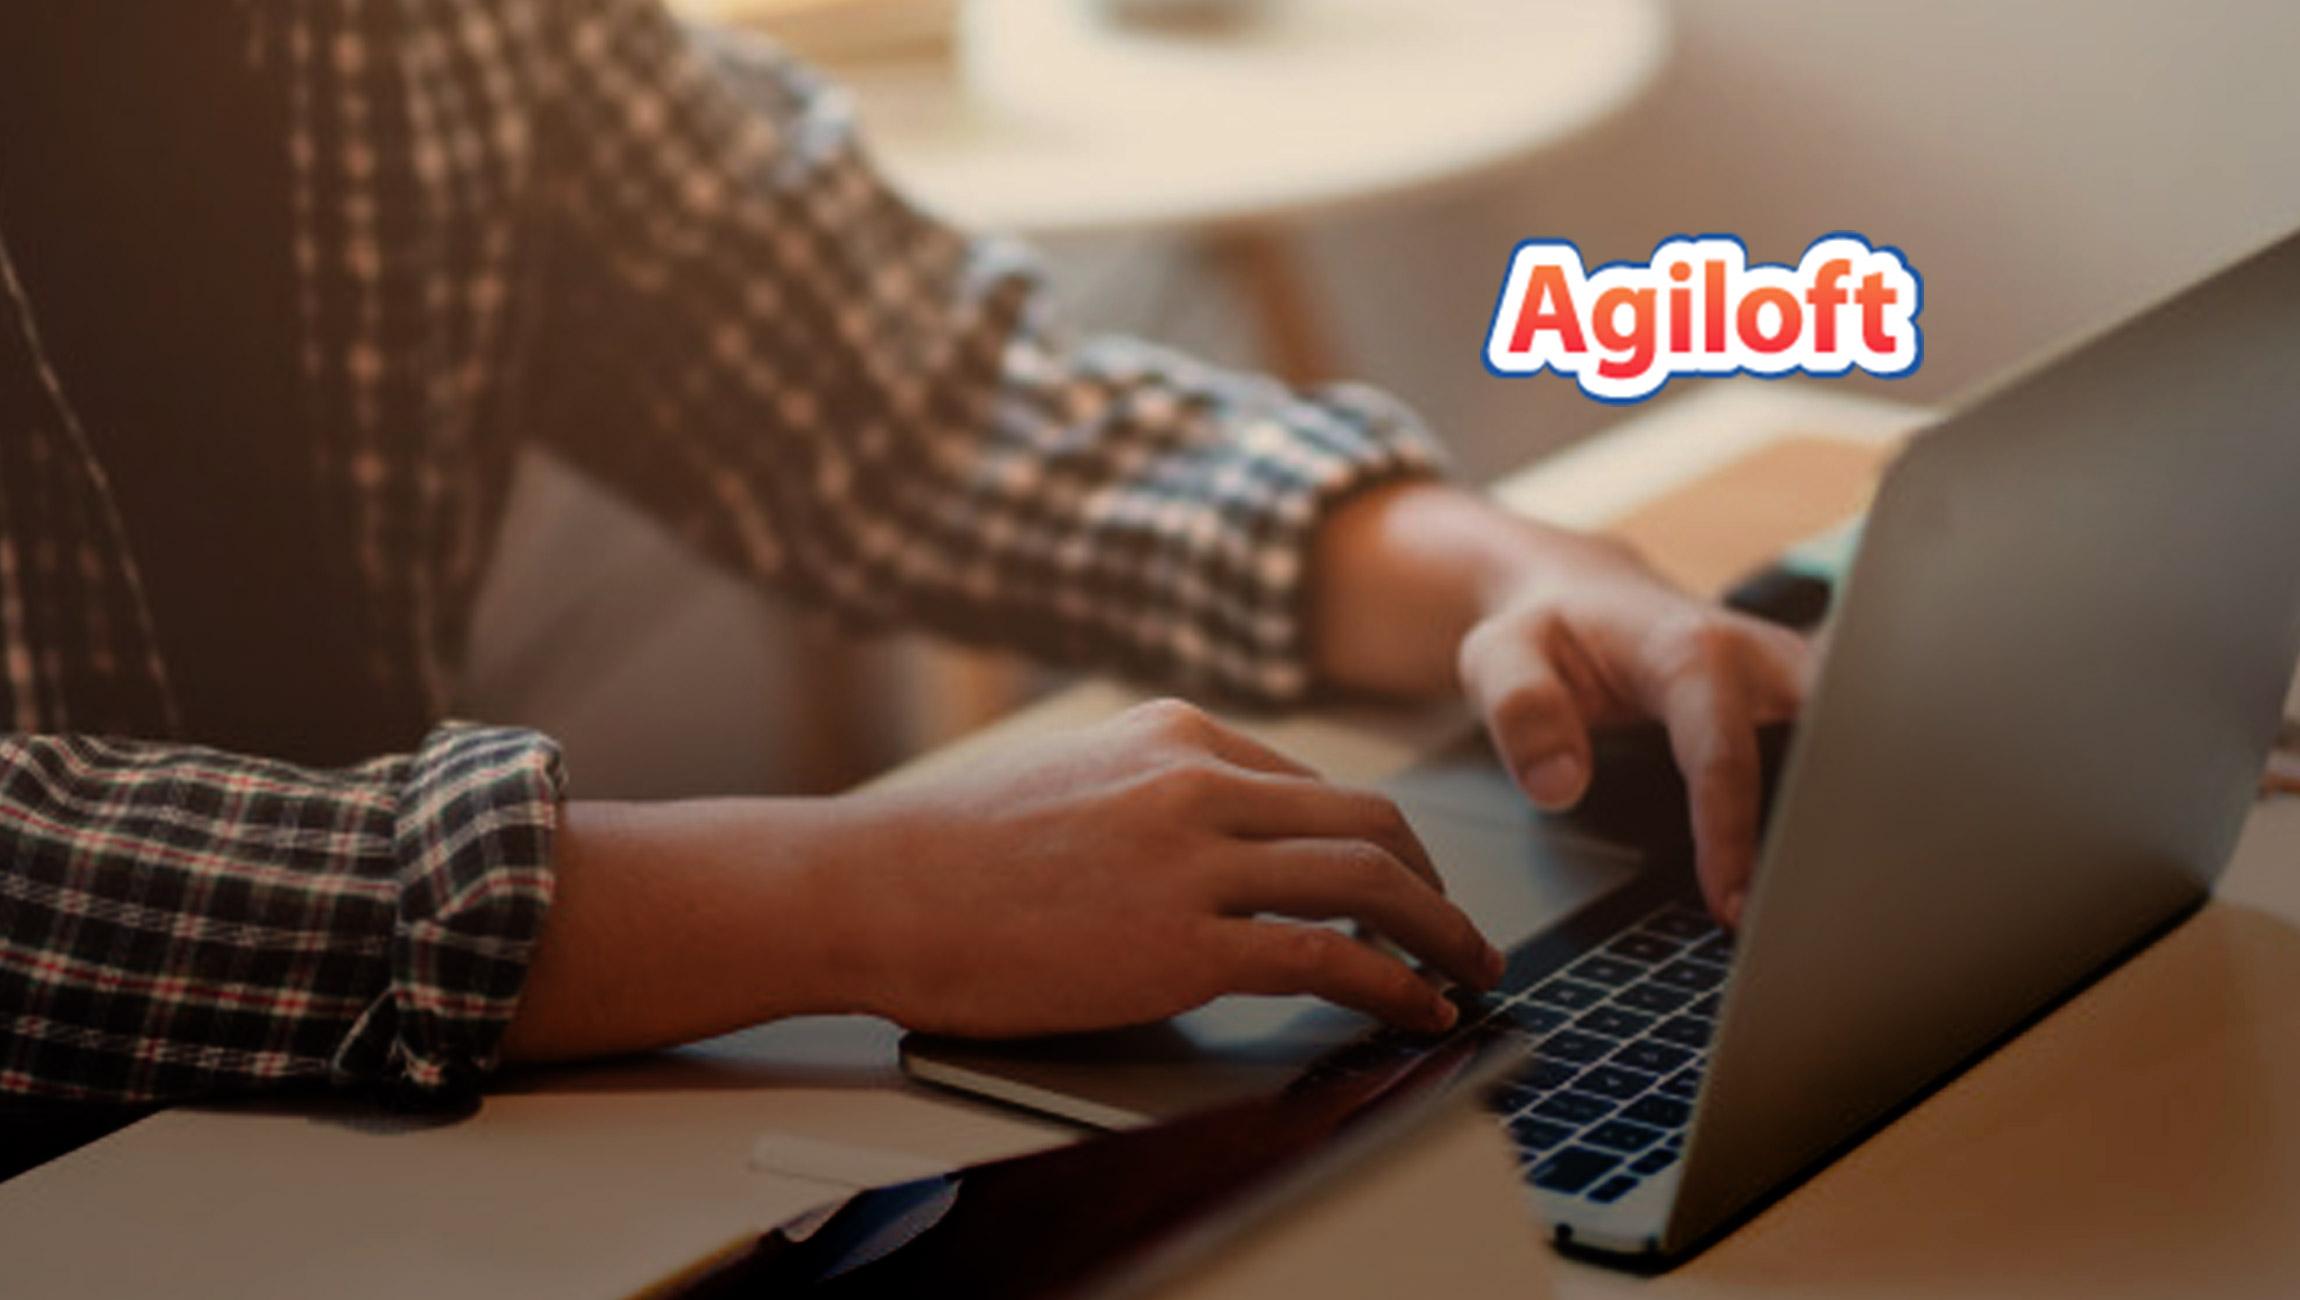 Agiloft Announces Advances in AI Engine, Usability, and Integrations to Accelerate Enterprise Contract Transformation